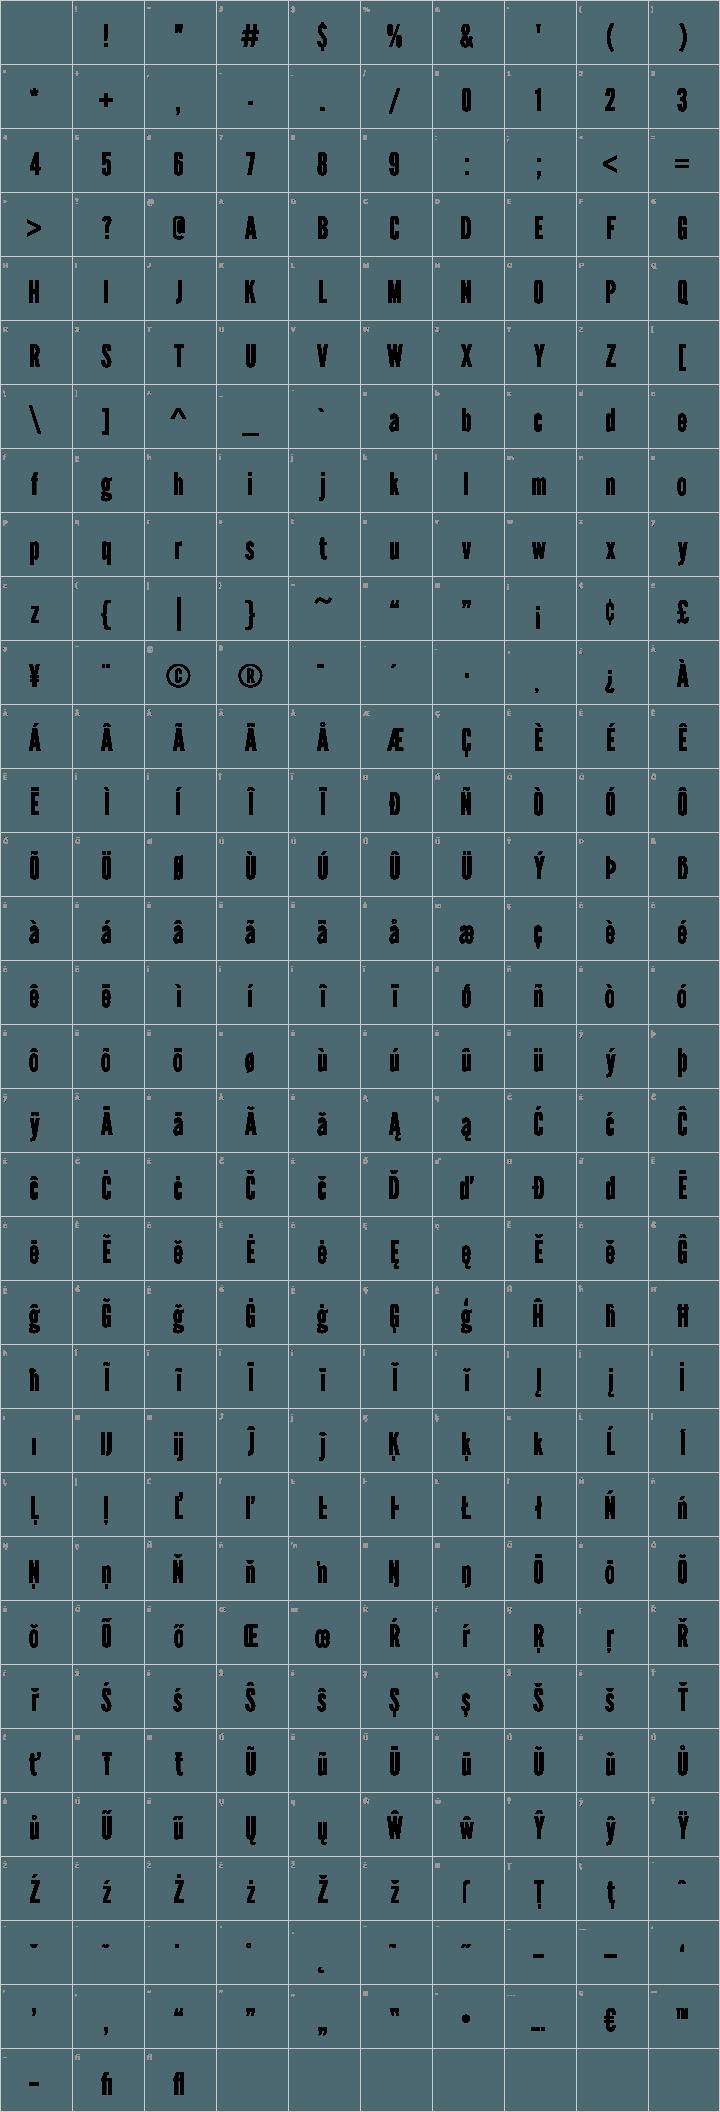 gm 720 18 333333 10 1 1 - Macam Macam Jenis Font Huruf